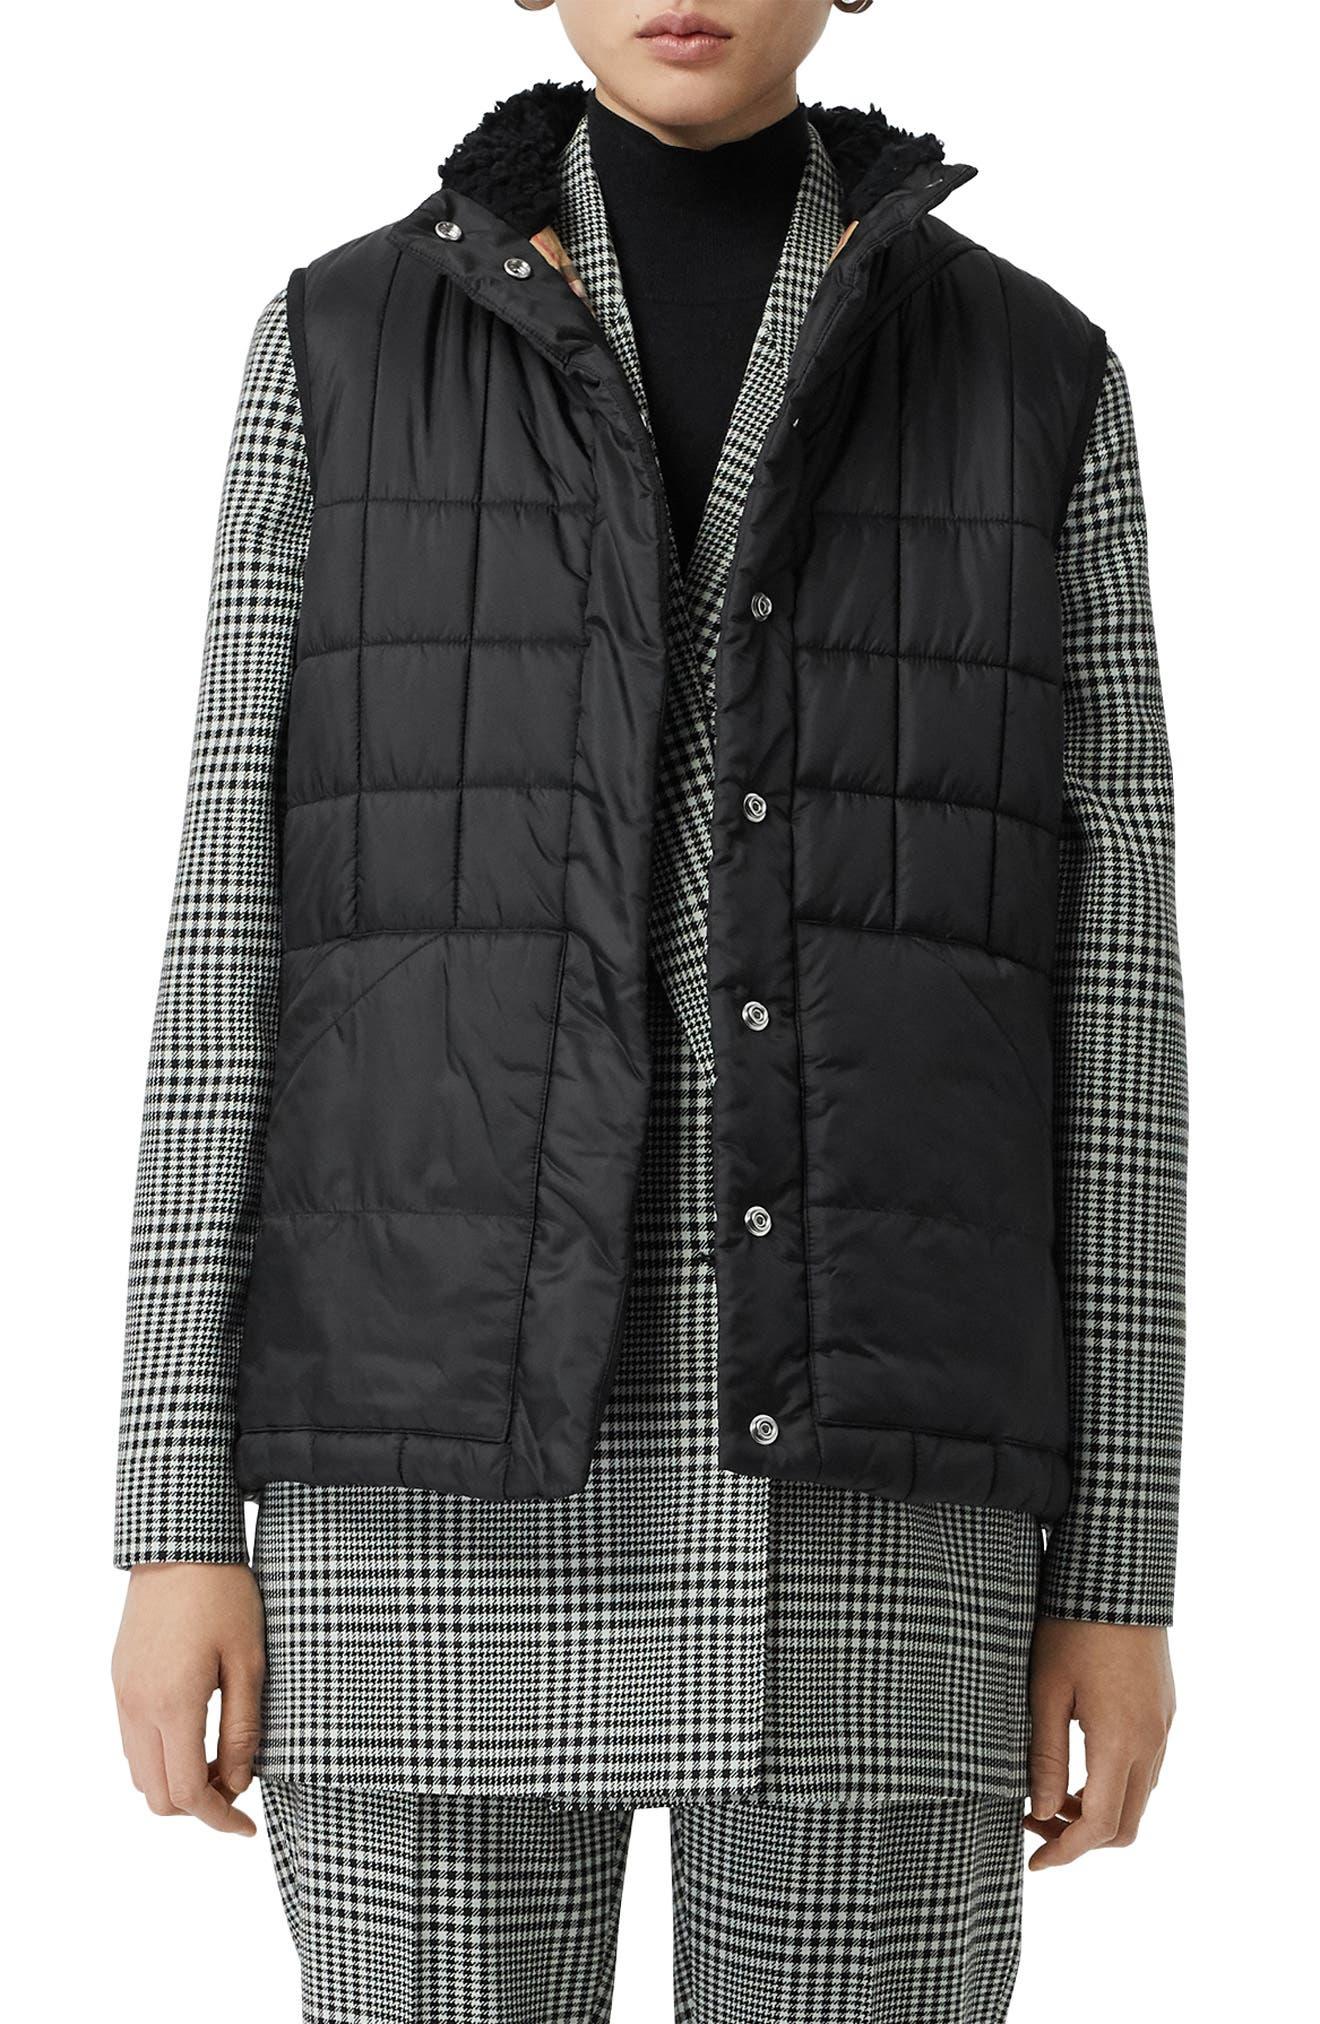 Leintune Faux Shearling Trim Quilted Vest, Main, color, BLACK